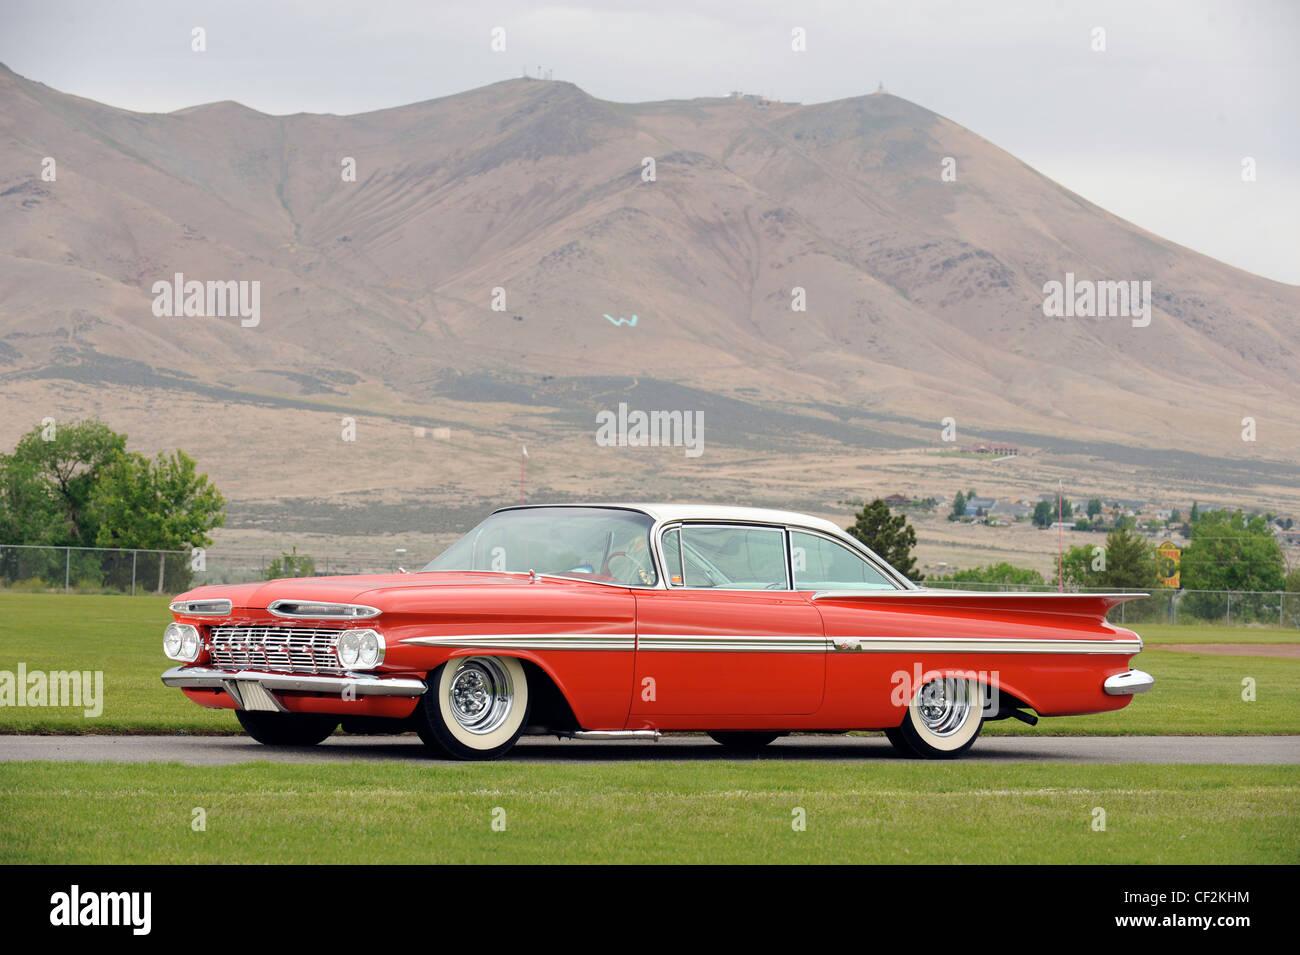 1959 chevrolet impala bubble top